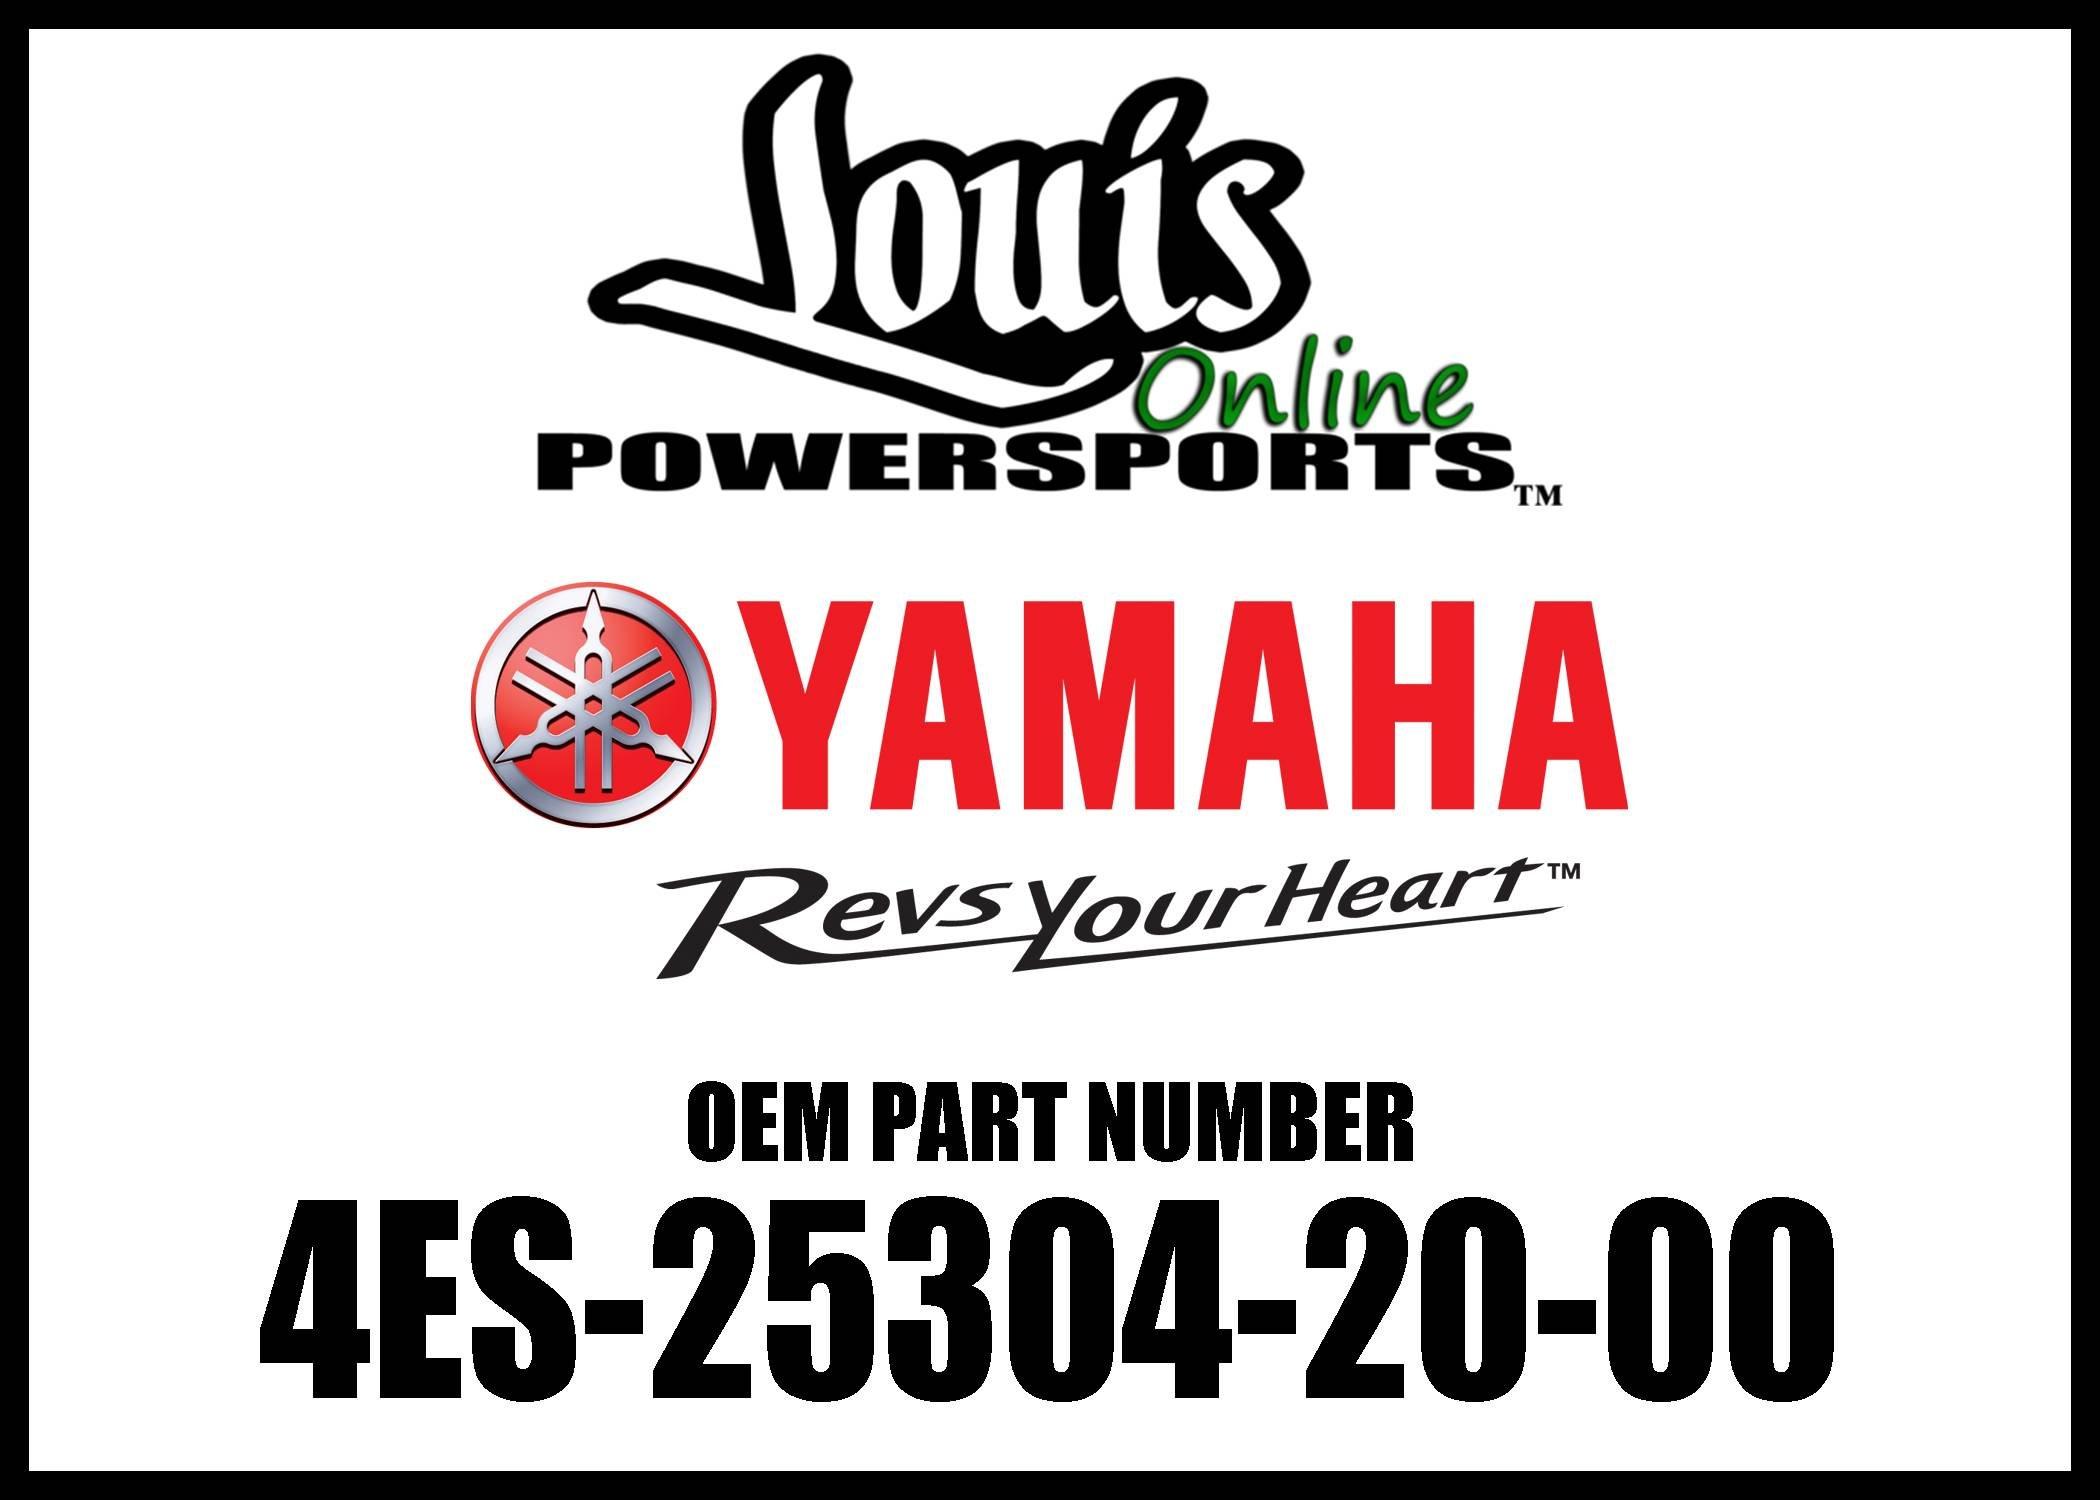 Yamaha 4ES253042000 Rear Spoke Set